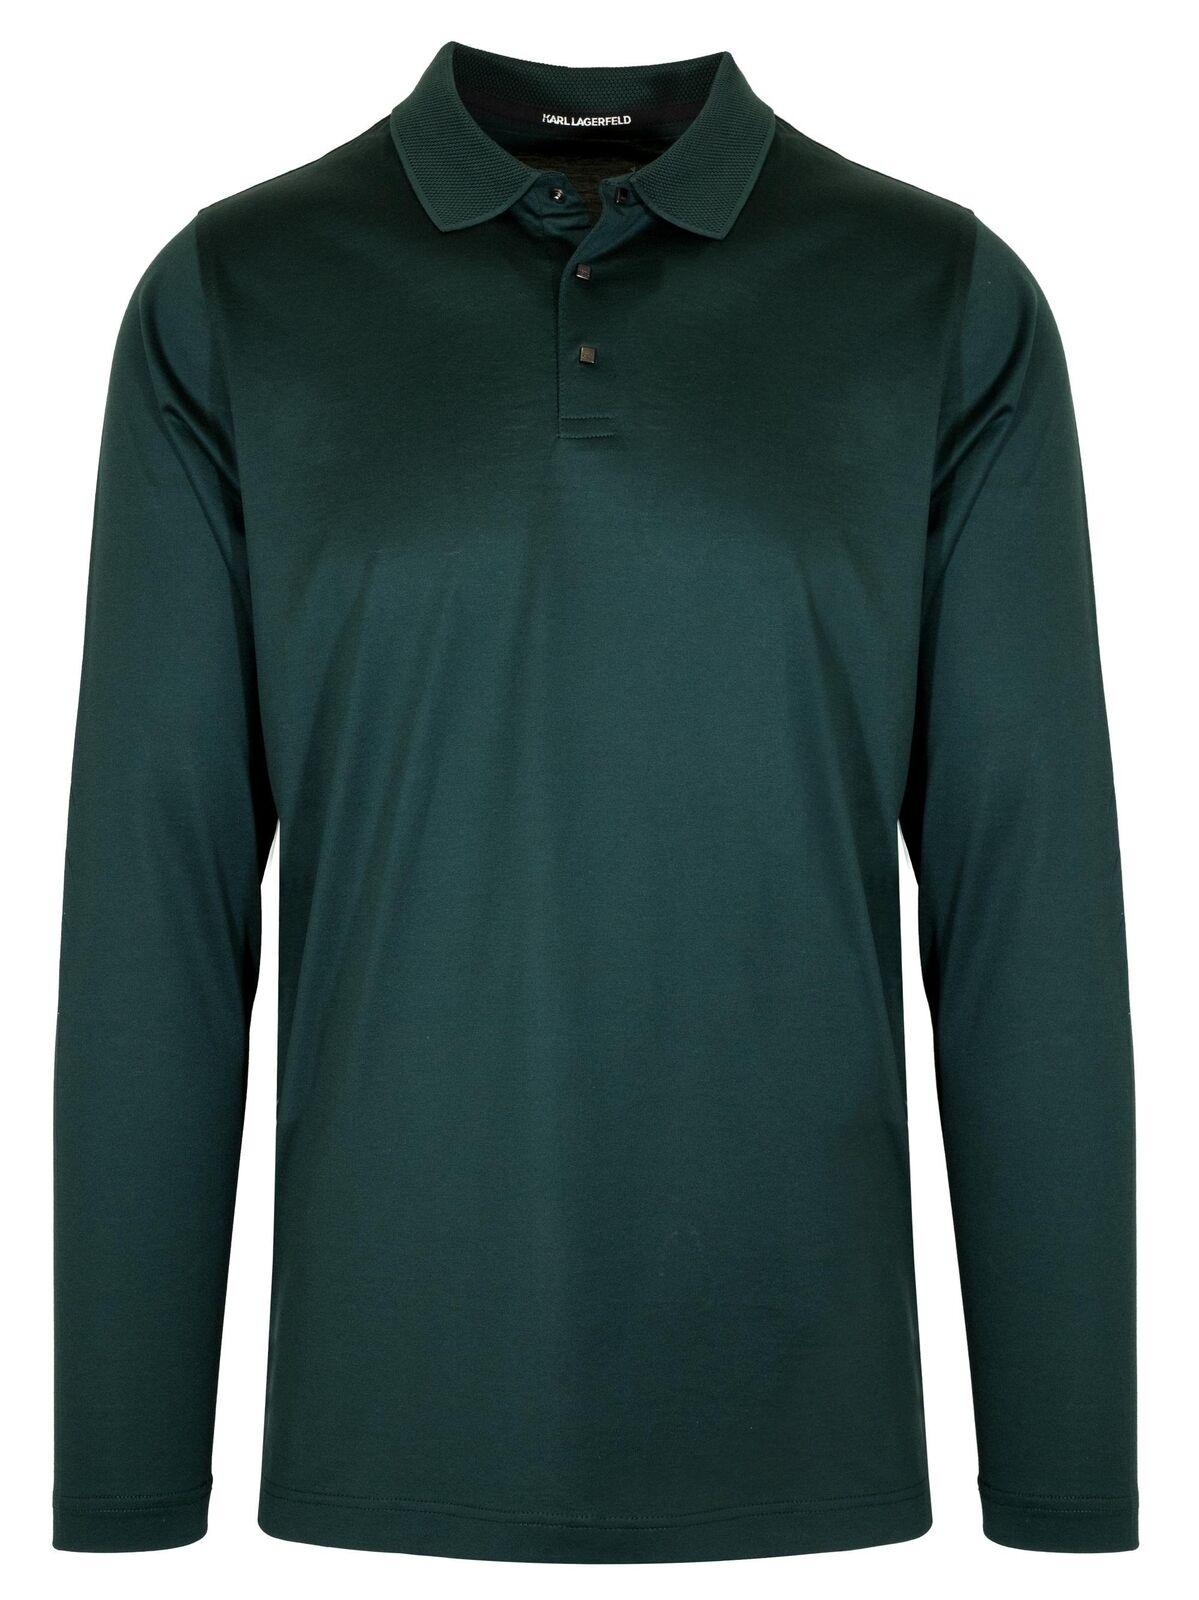 Lagerfeld Grün Contrast Collar Polo Shirt